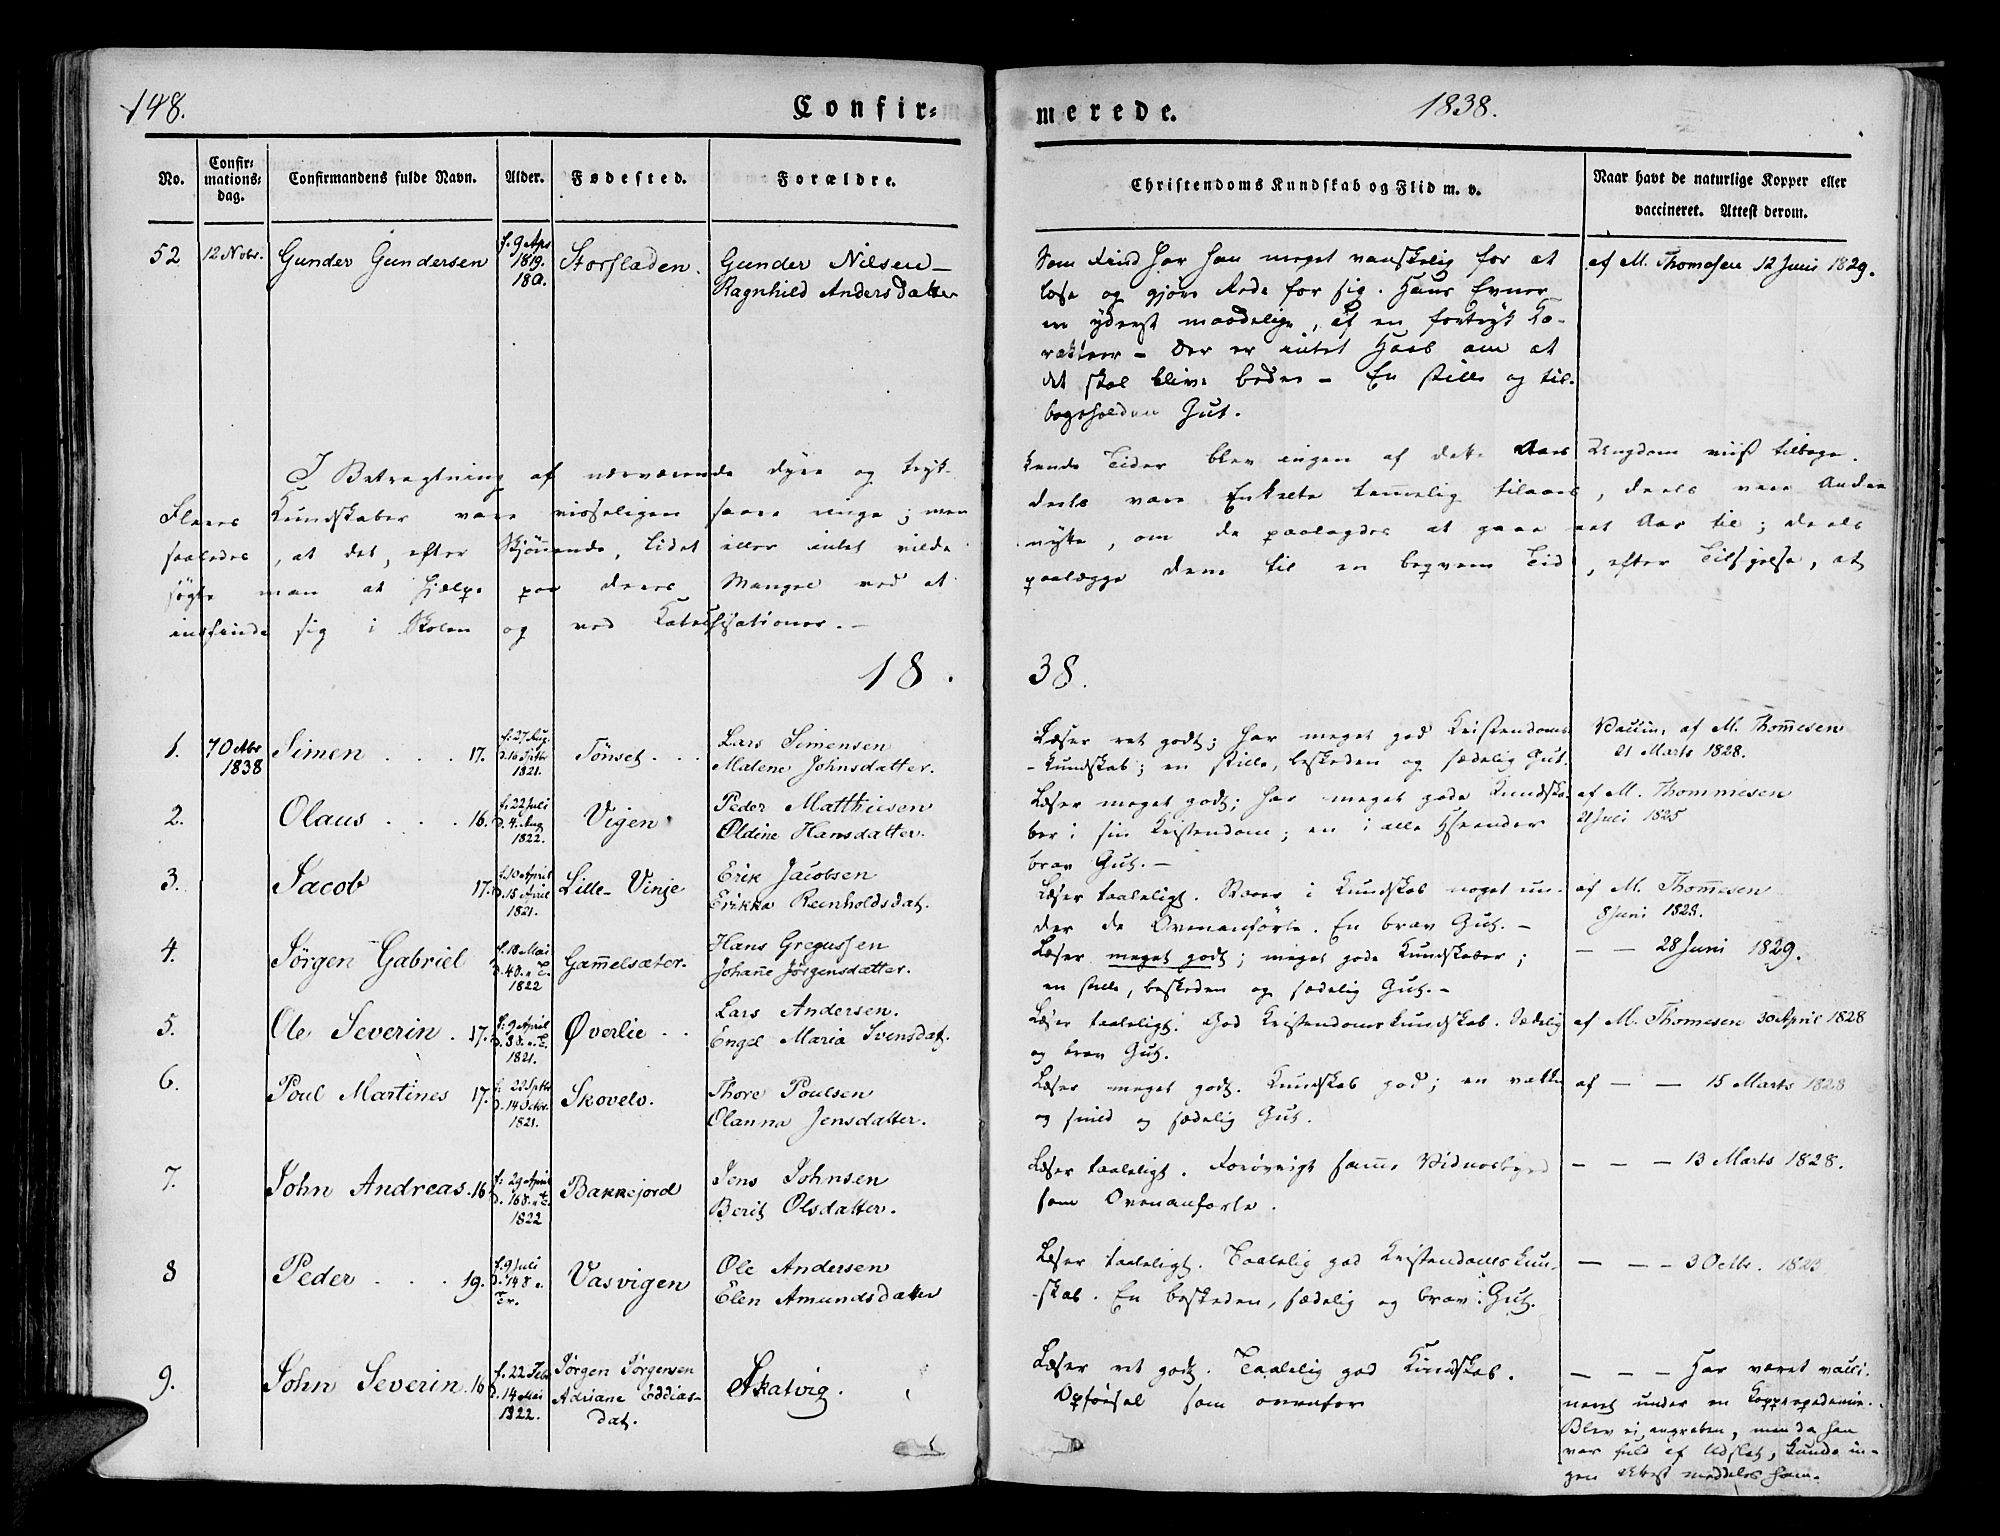 SATØ, Tranøy sokneprestkontor, I/Ia/Iaa/L0005kirke: Ministerialbok nr. 5, 1829-1844, s. 148